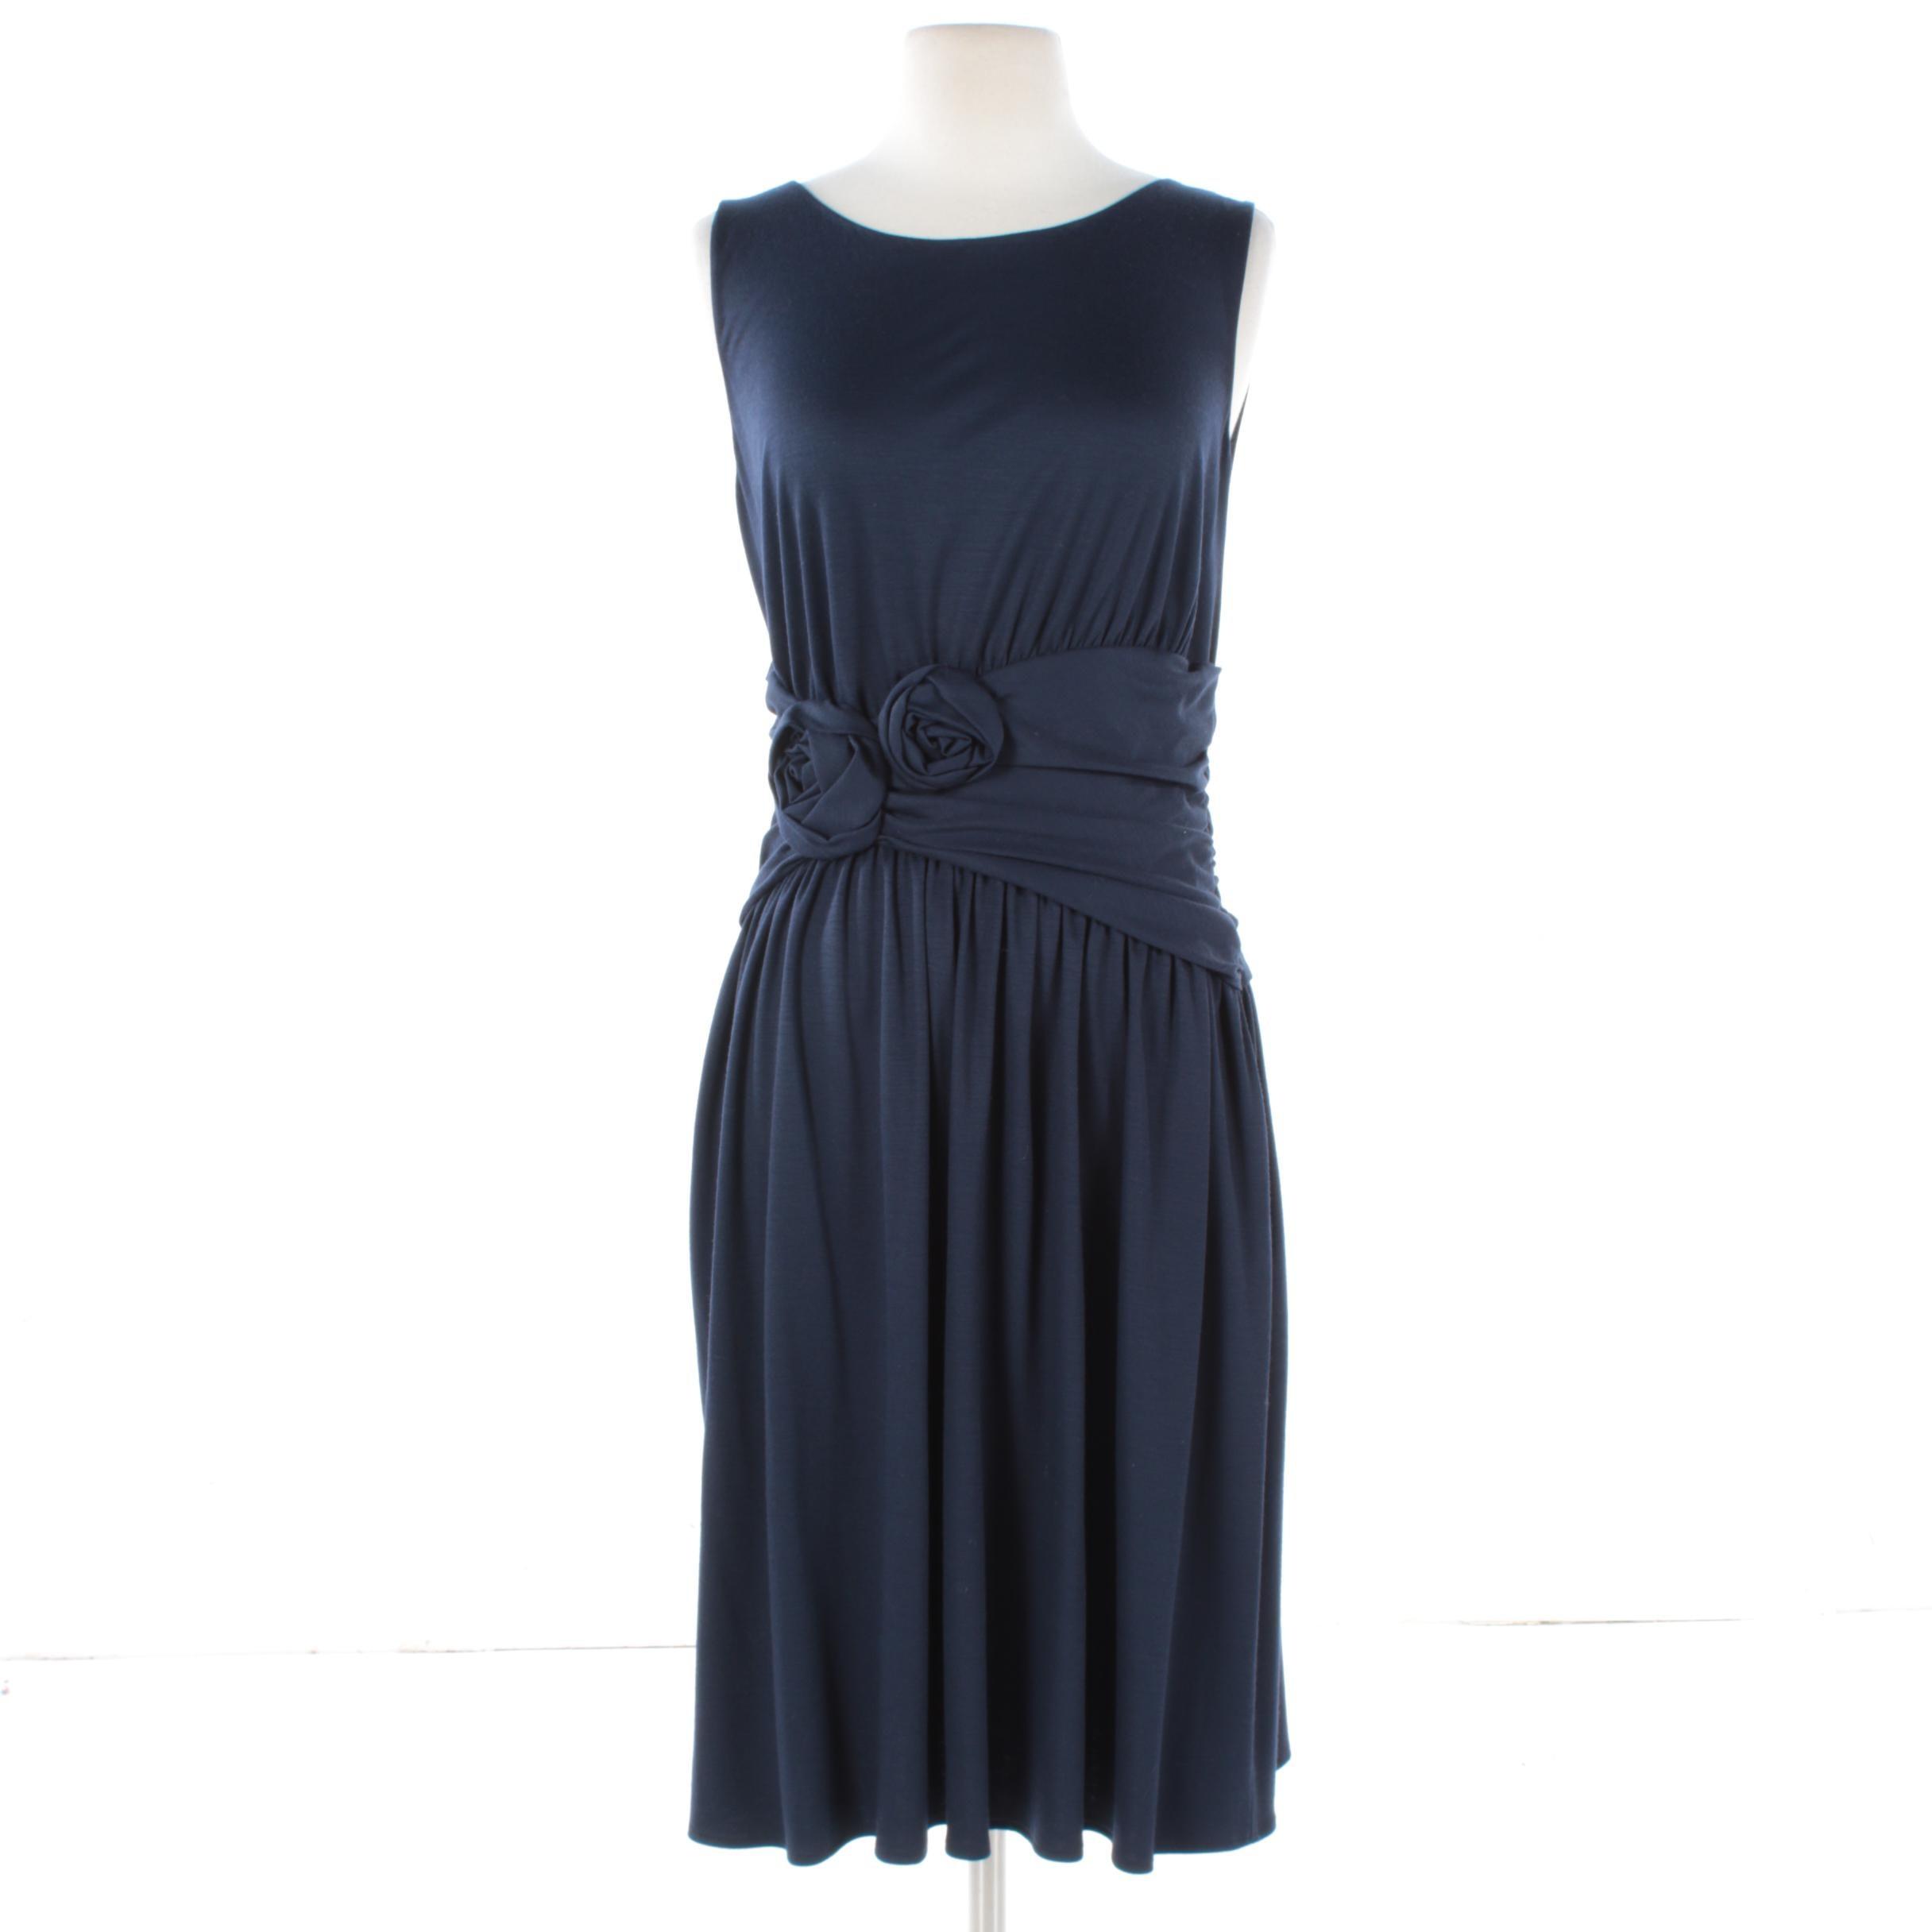 Moschino Cheap and Chic Navy Blue Sleeveless Dress